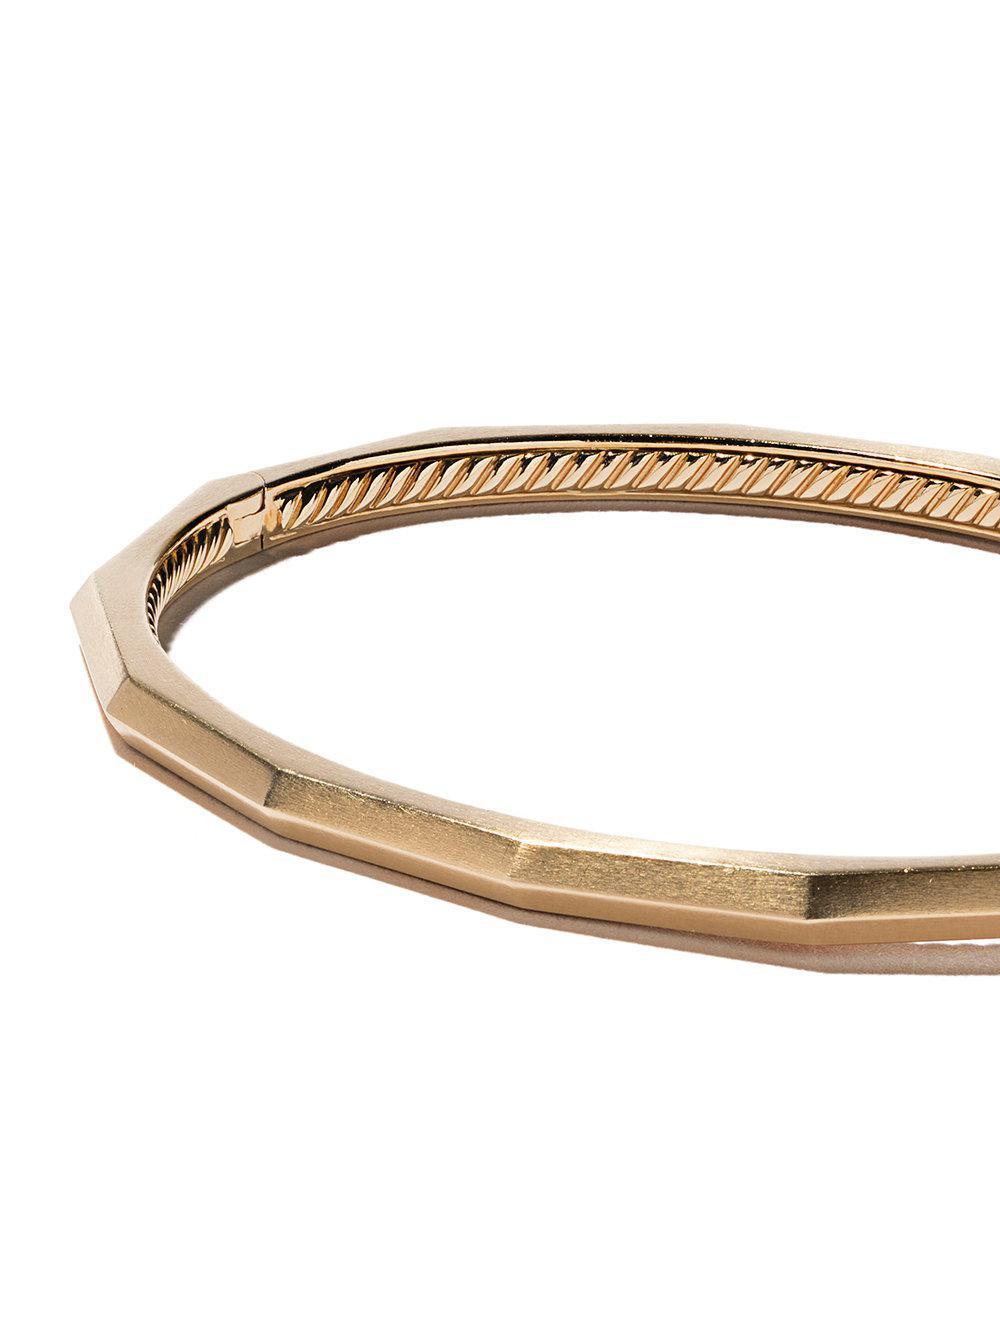 David Yurman 18kt yellow gold Stax faceted diamond bangle - Metallic AvUiXctrWV